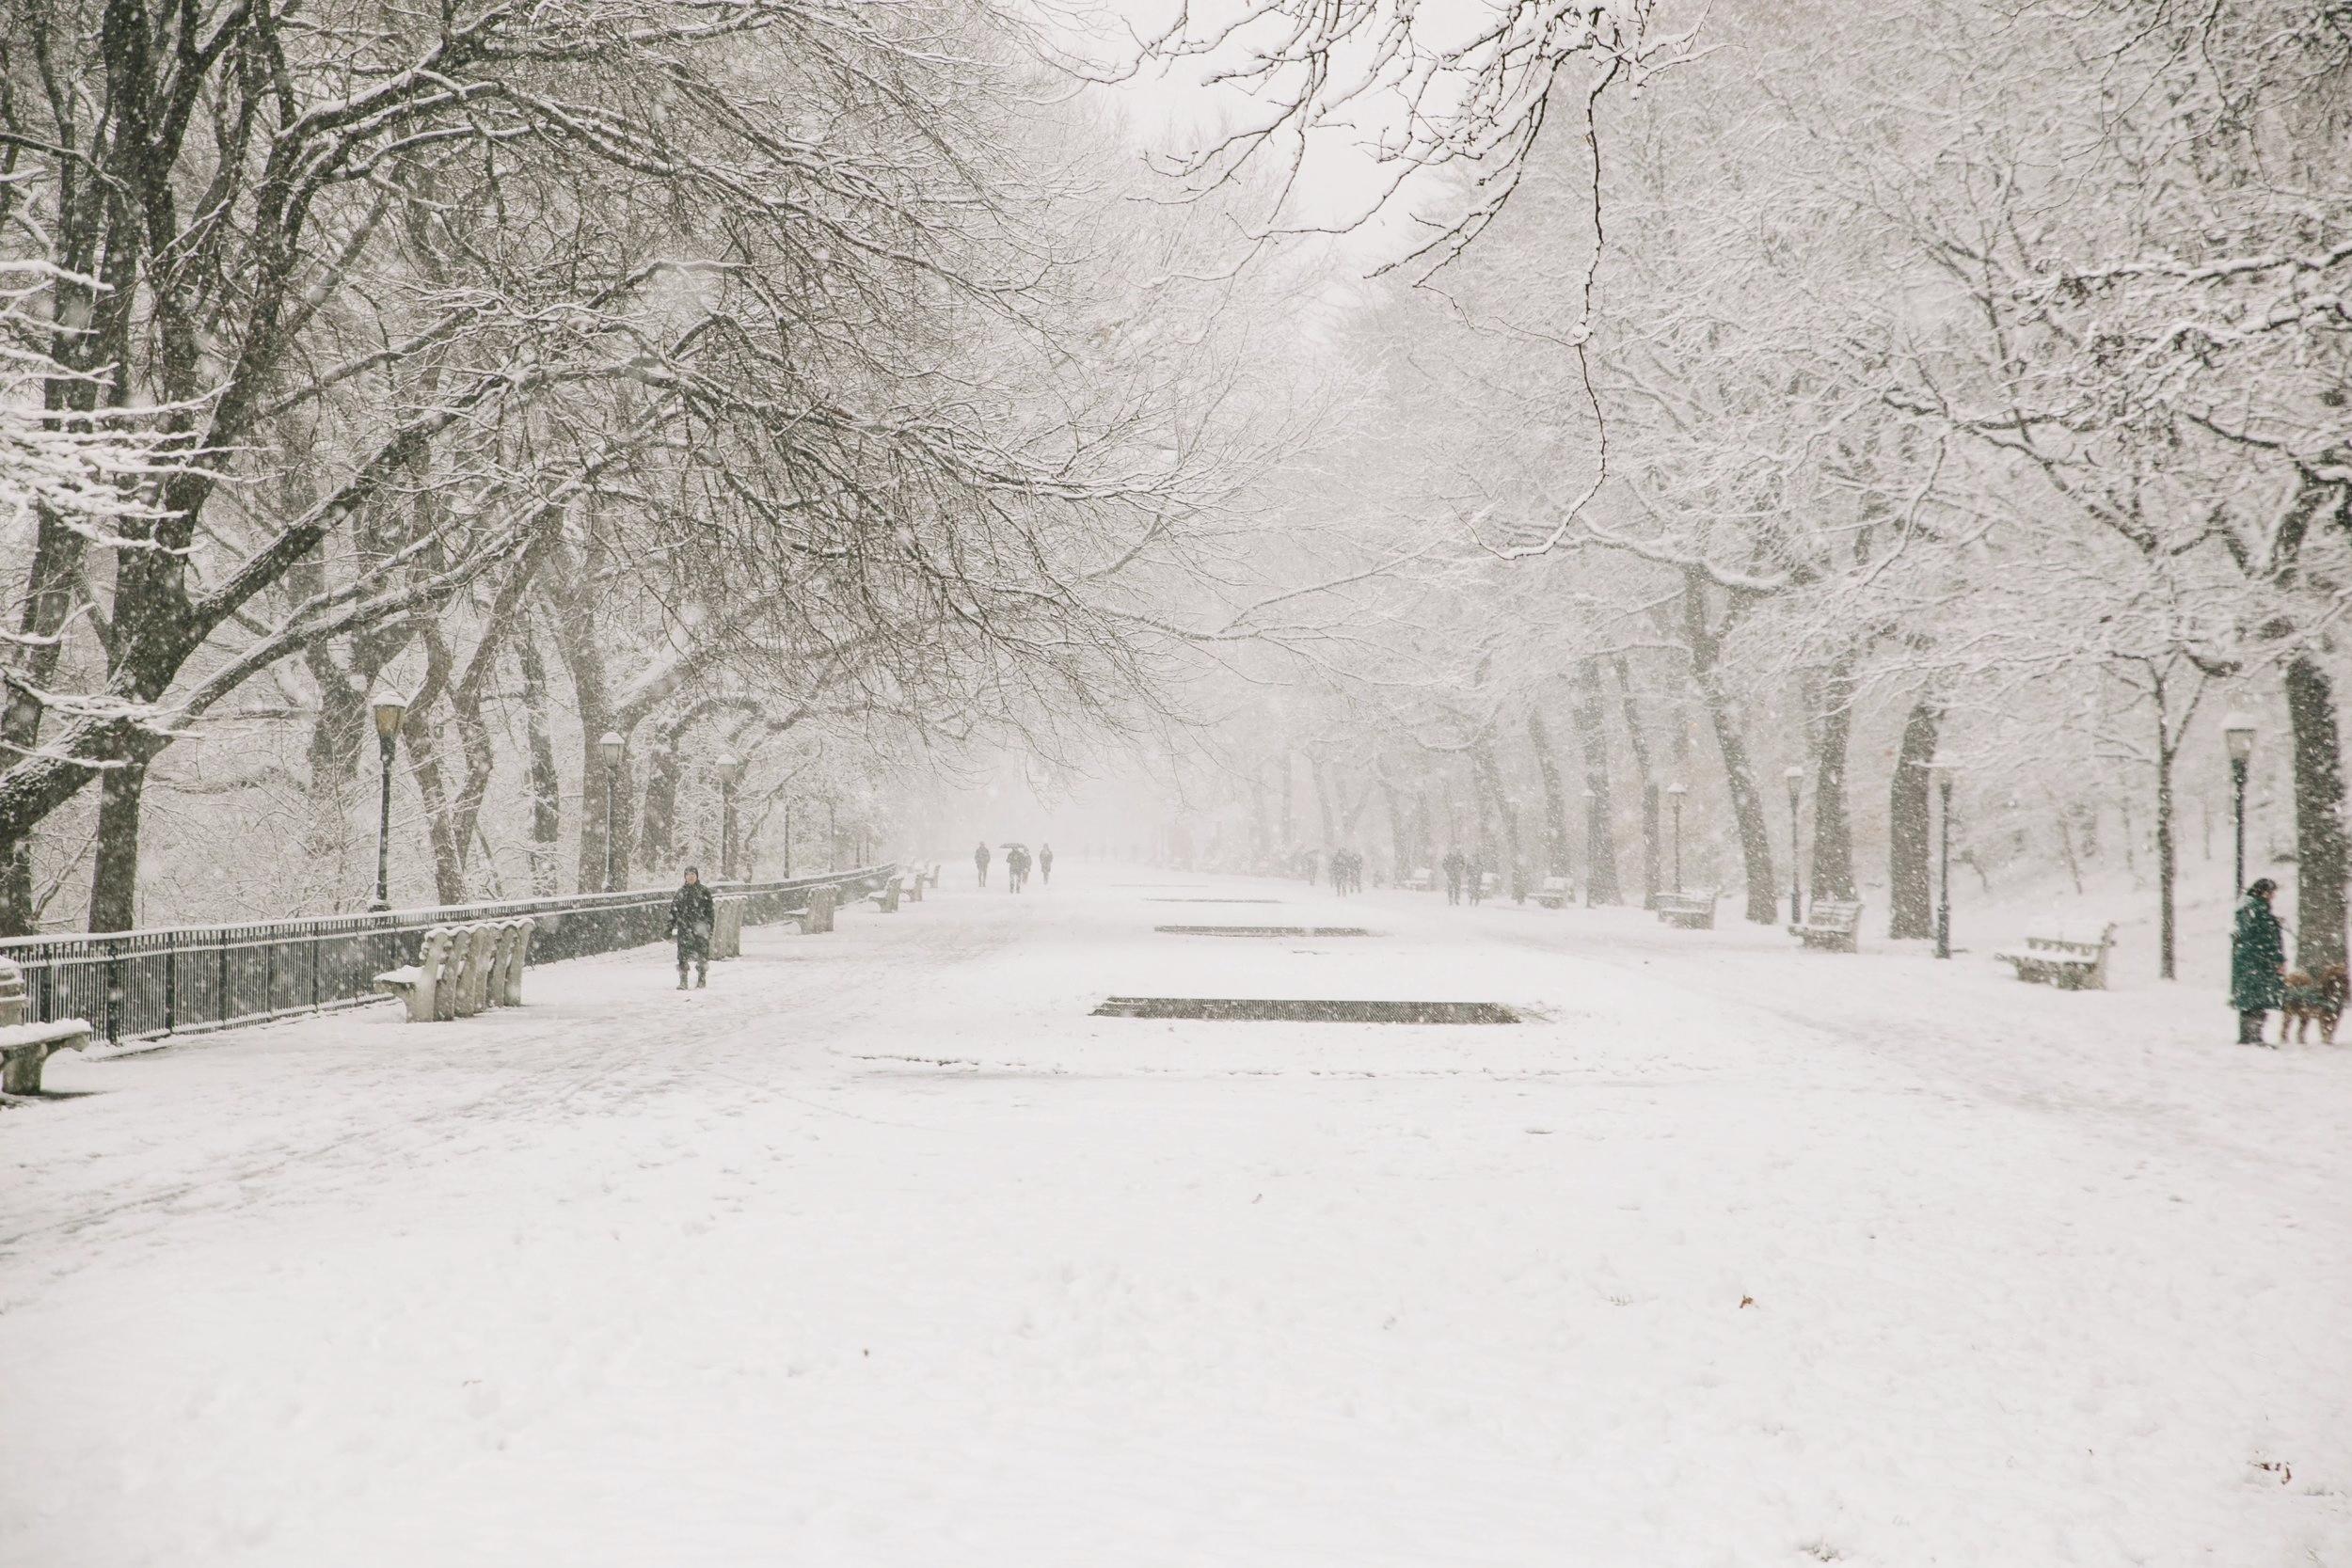 Riverside Park in the snow